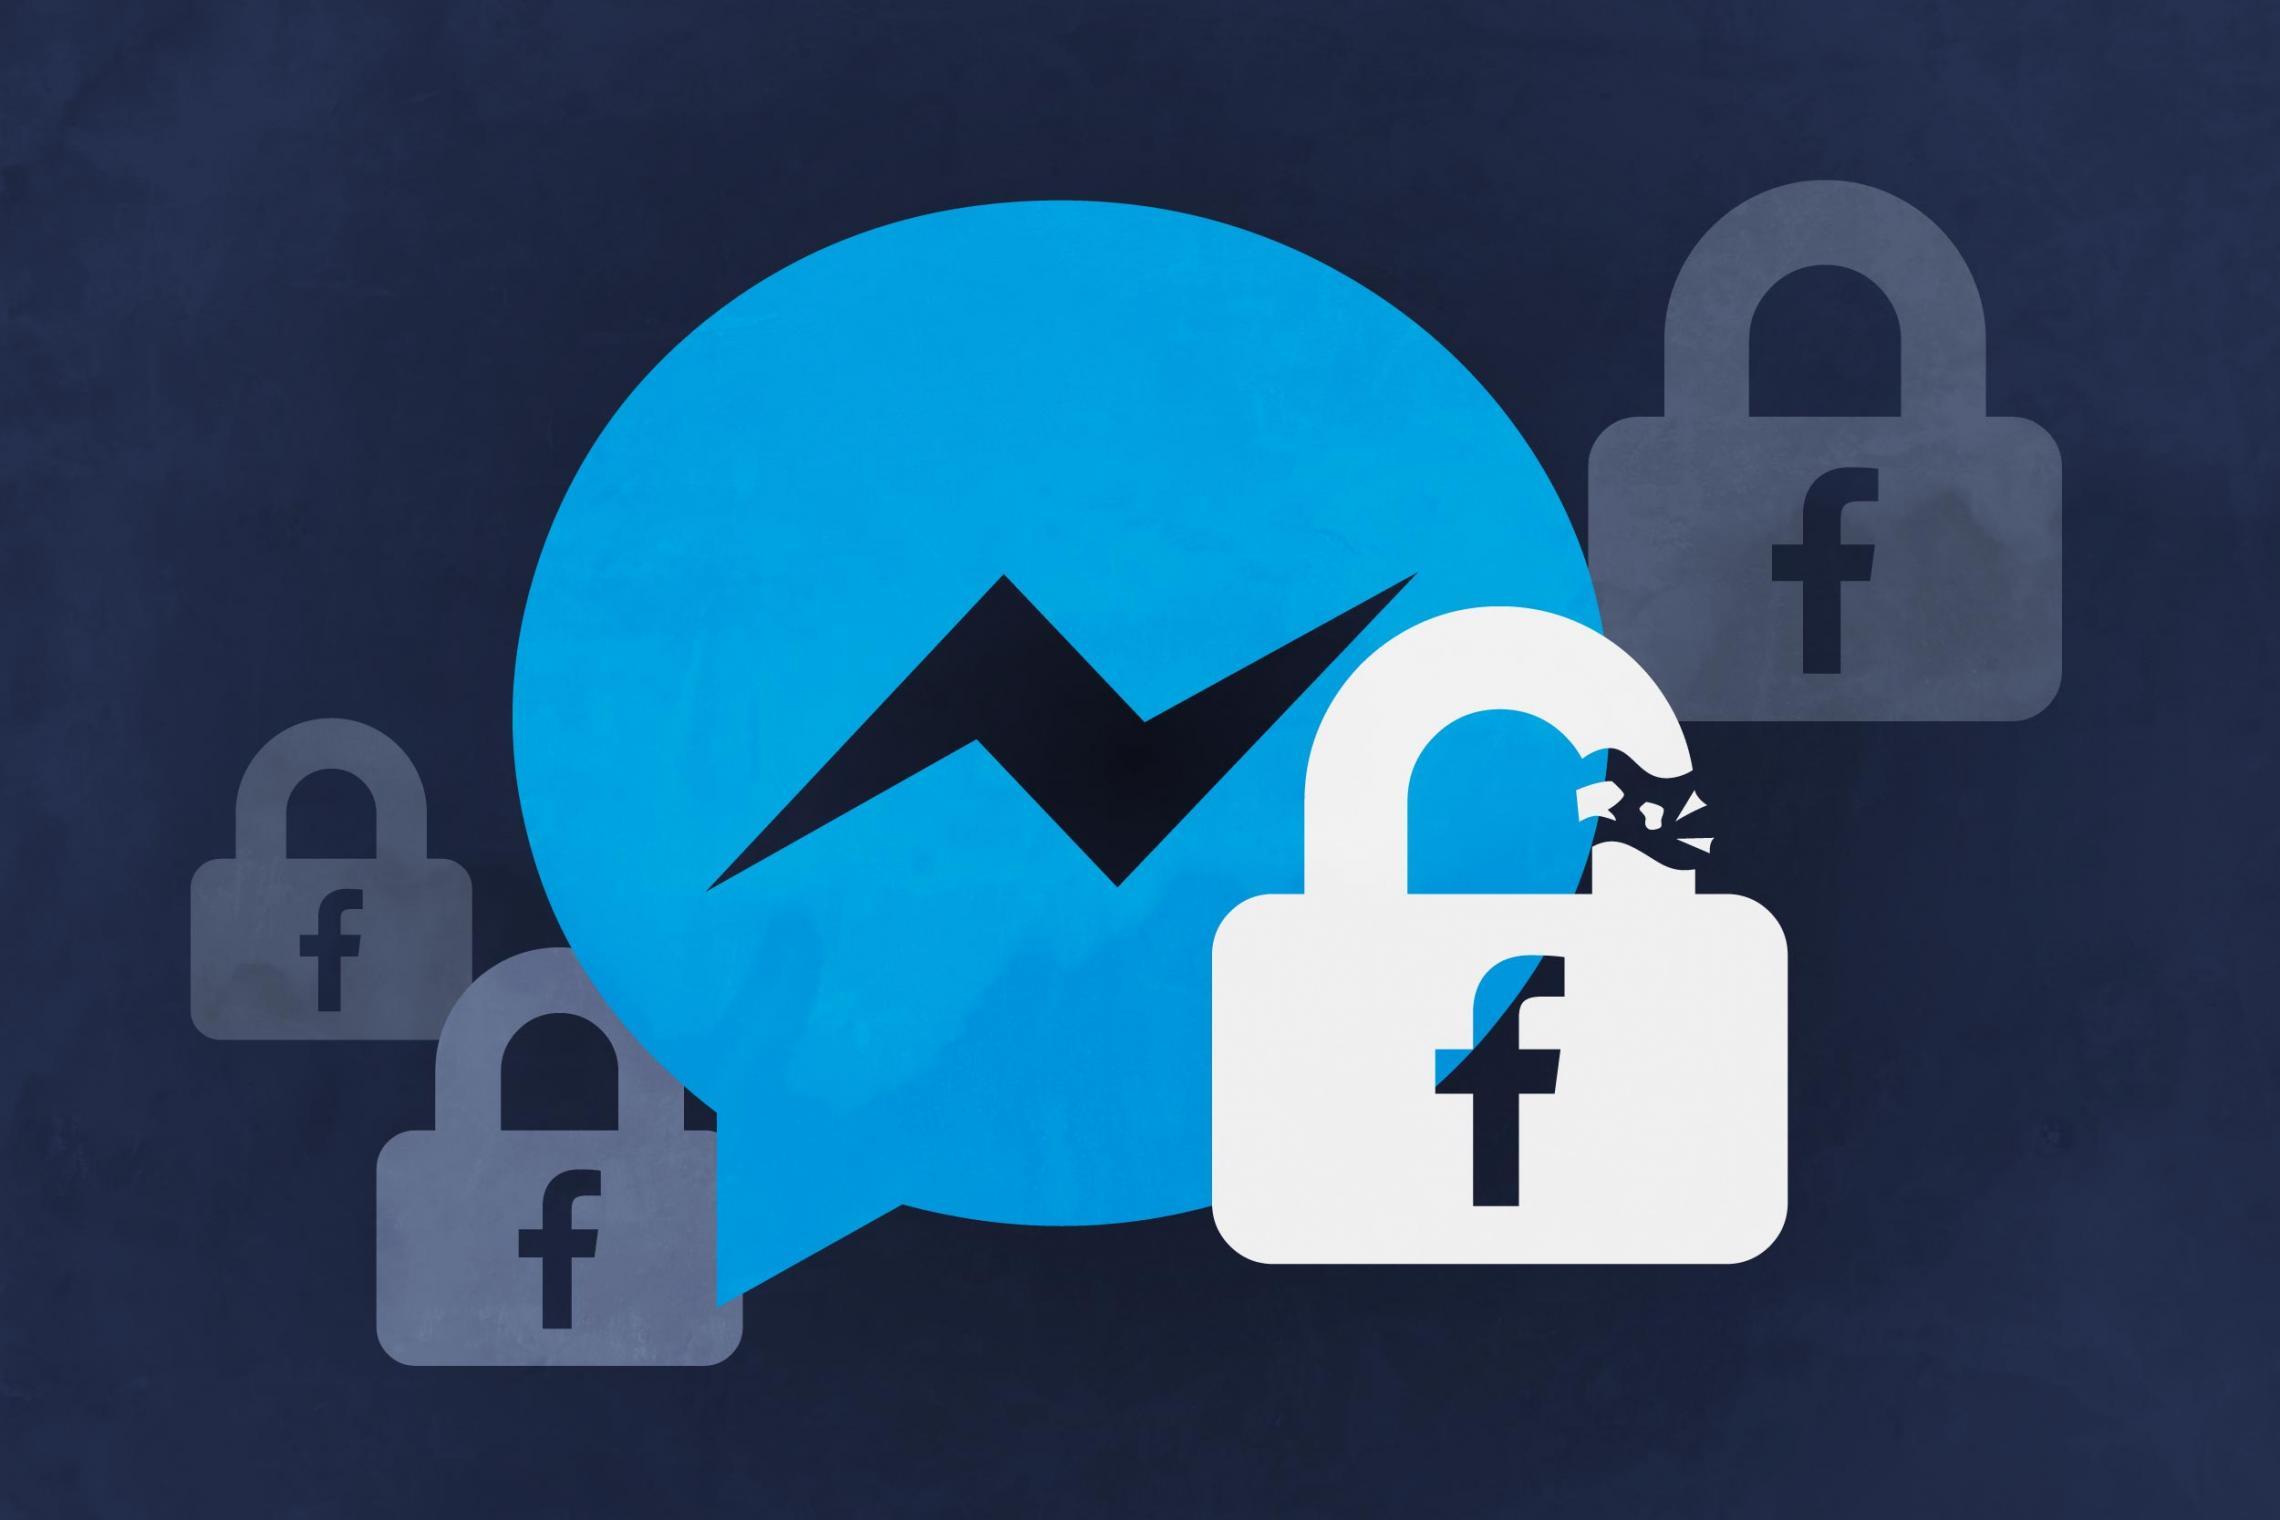 Q&A: Media Studies Professor Breaks Down Facebook Encryption Issue